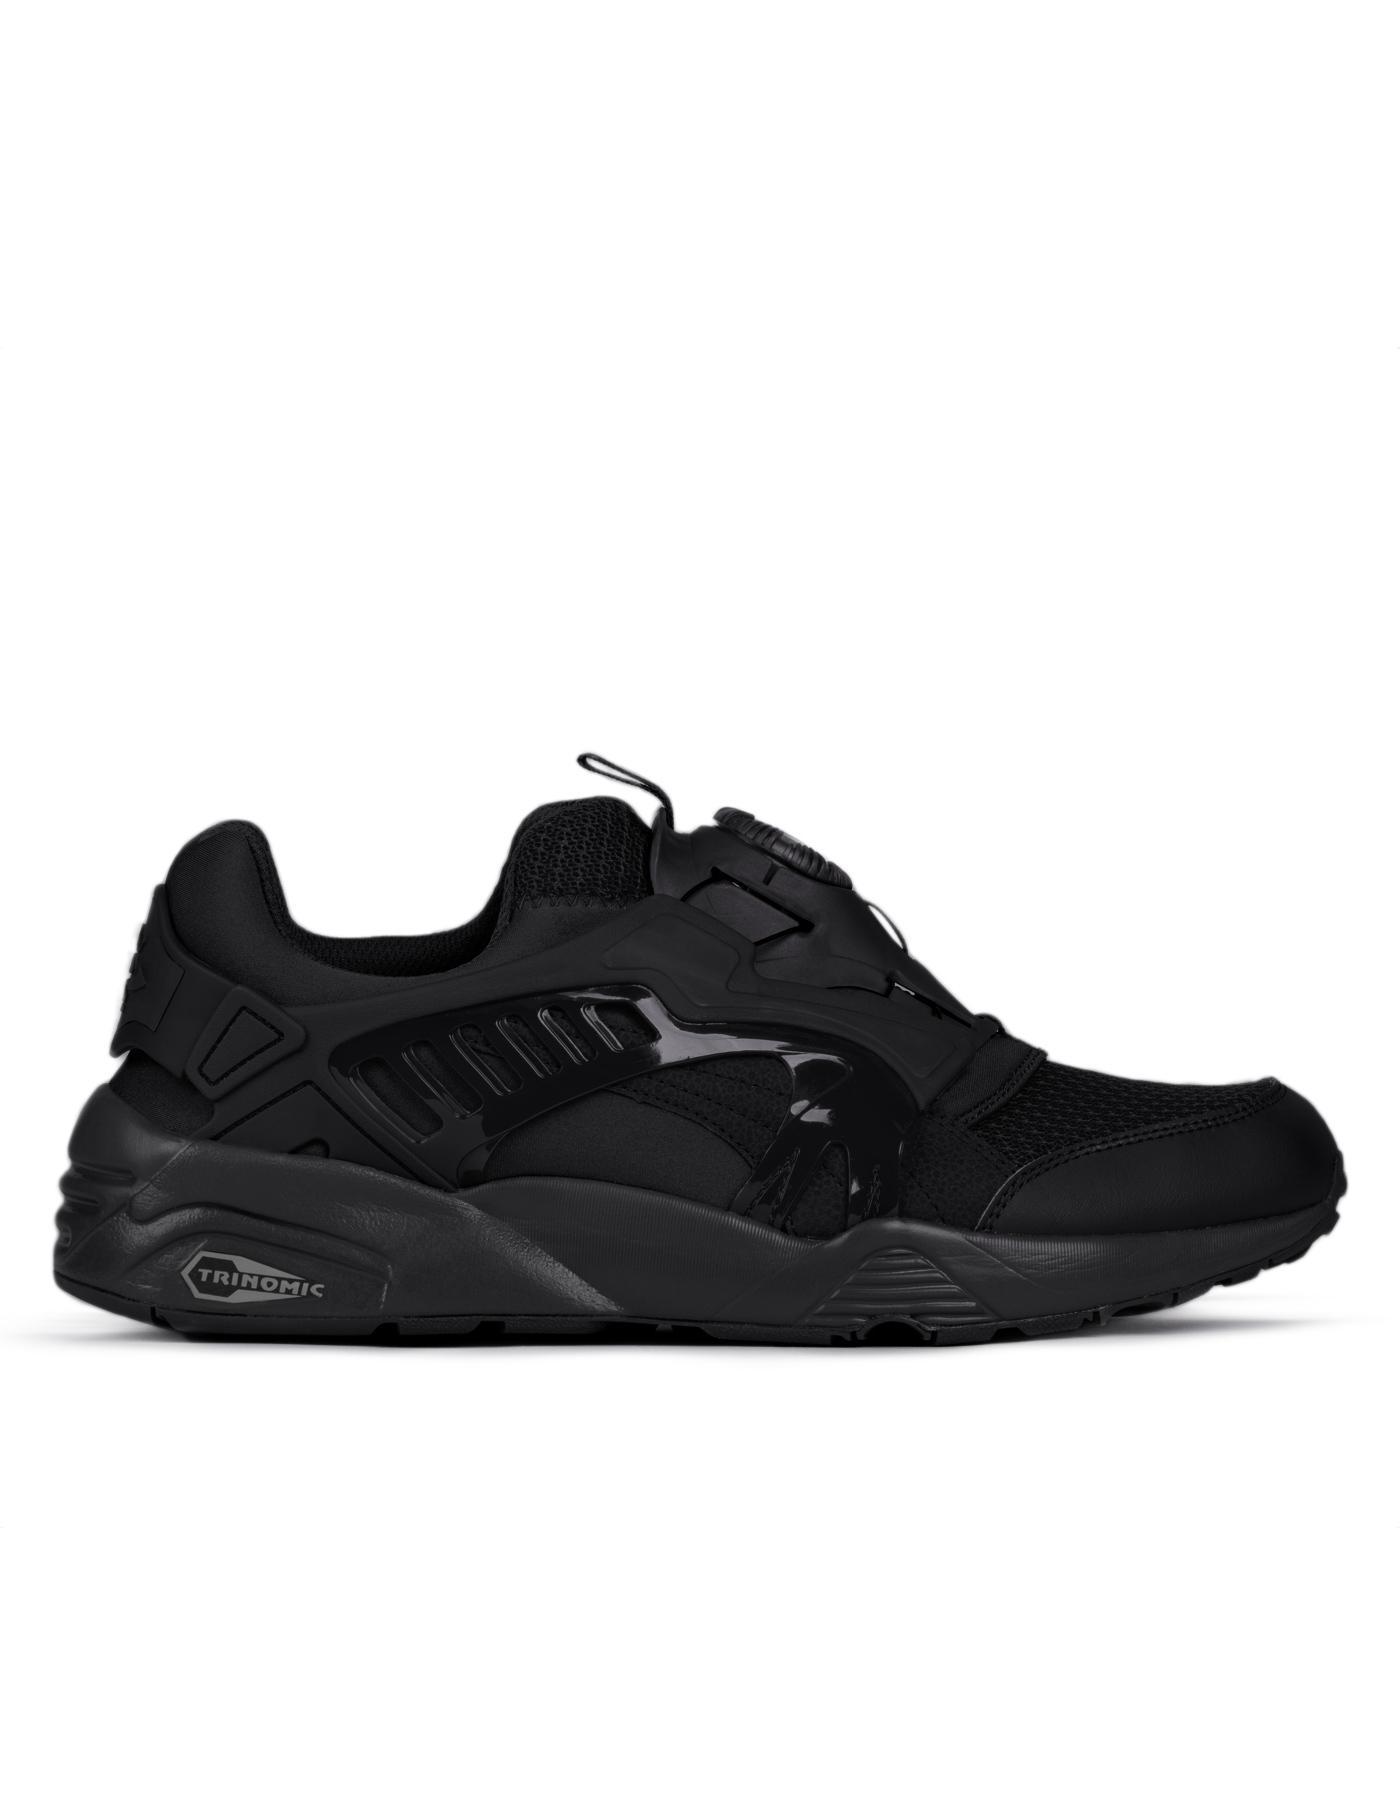 Puma Disc Blaze Ct in Black for Men - Lyst 40ab513c2